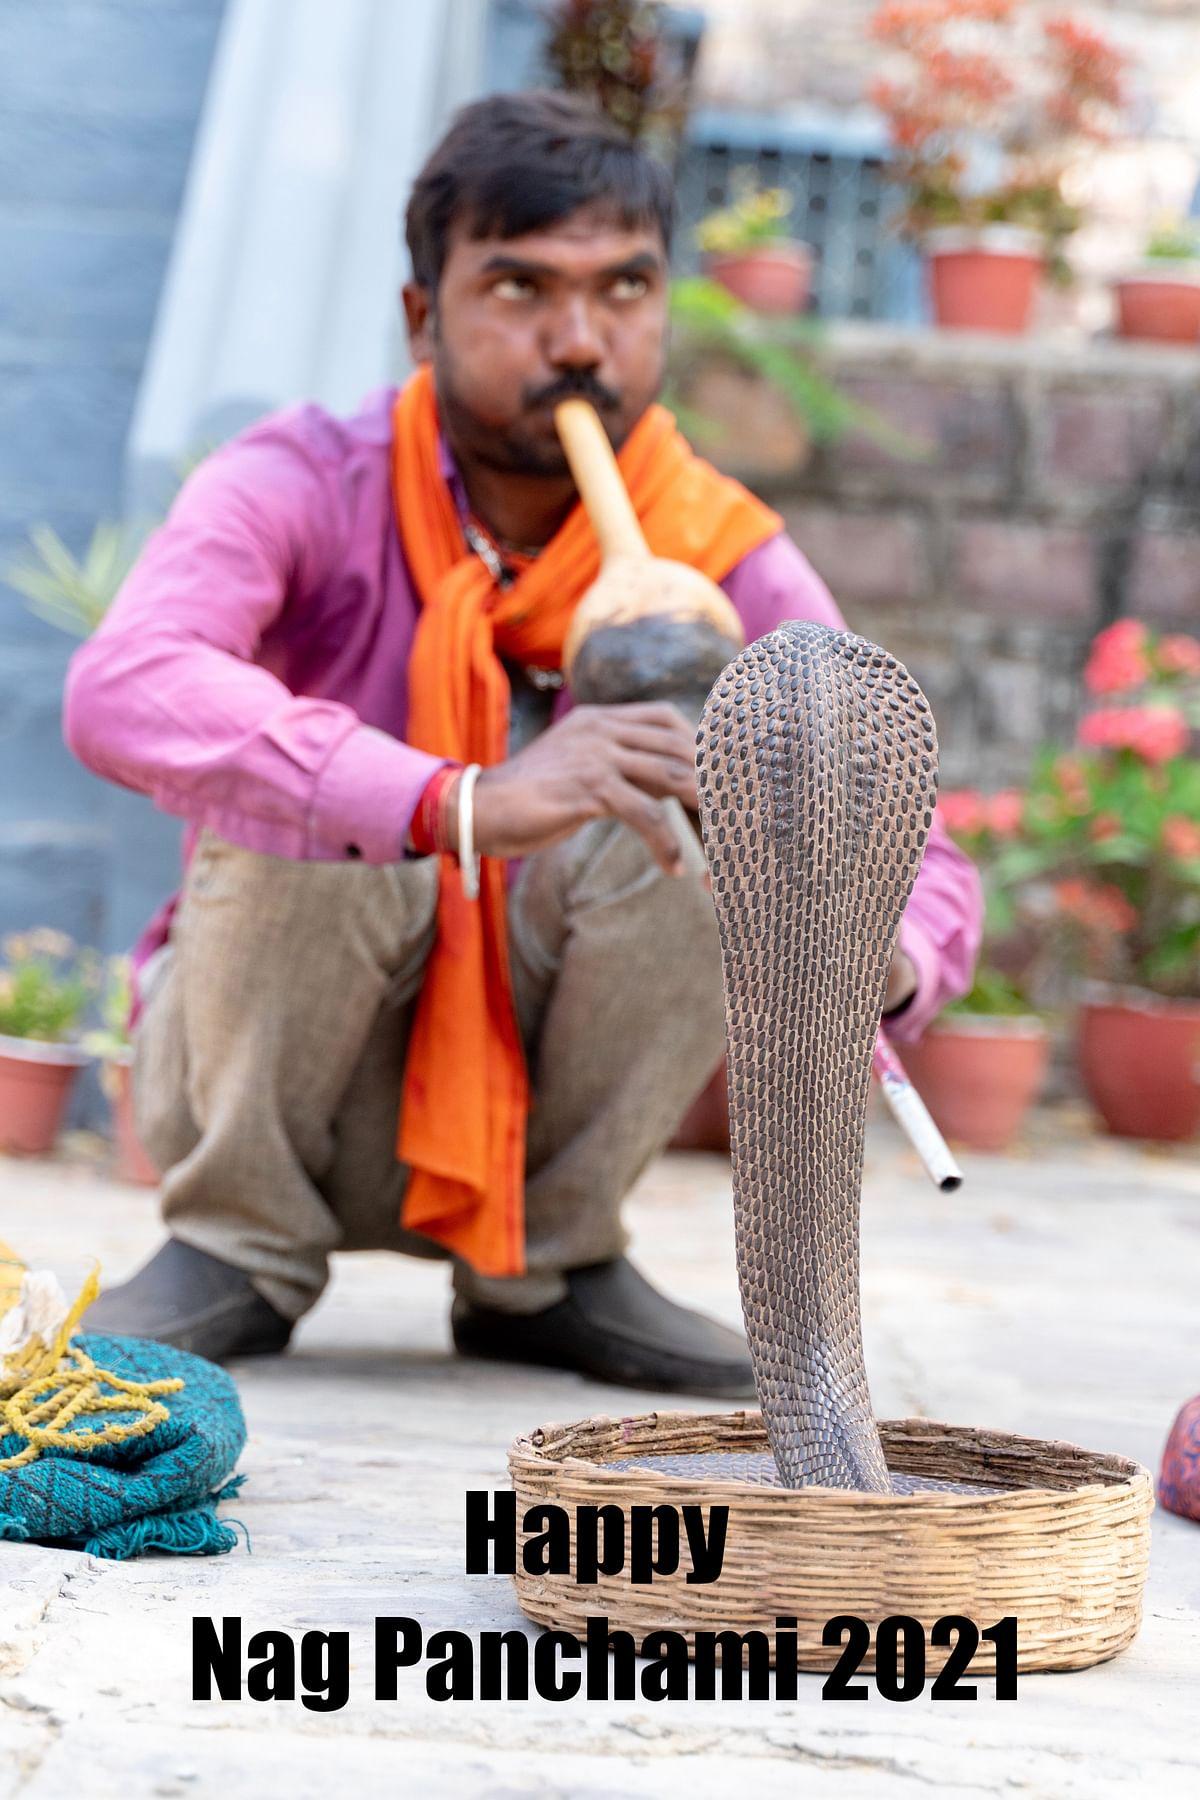 Happy Nag Panchami 2021, Wishes images